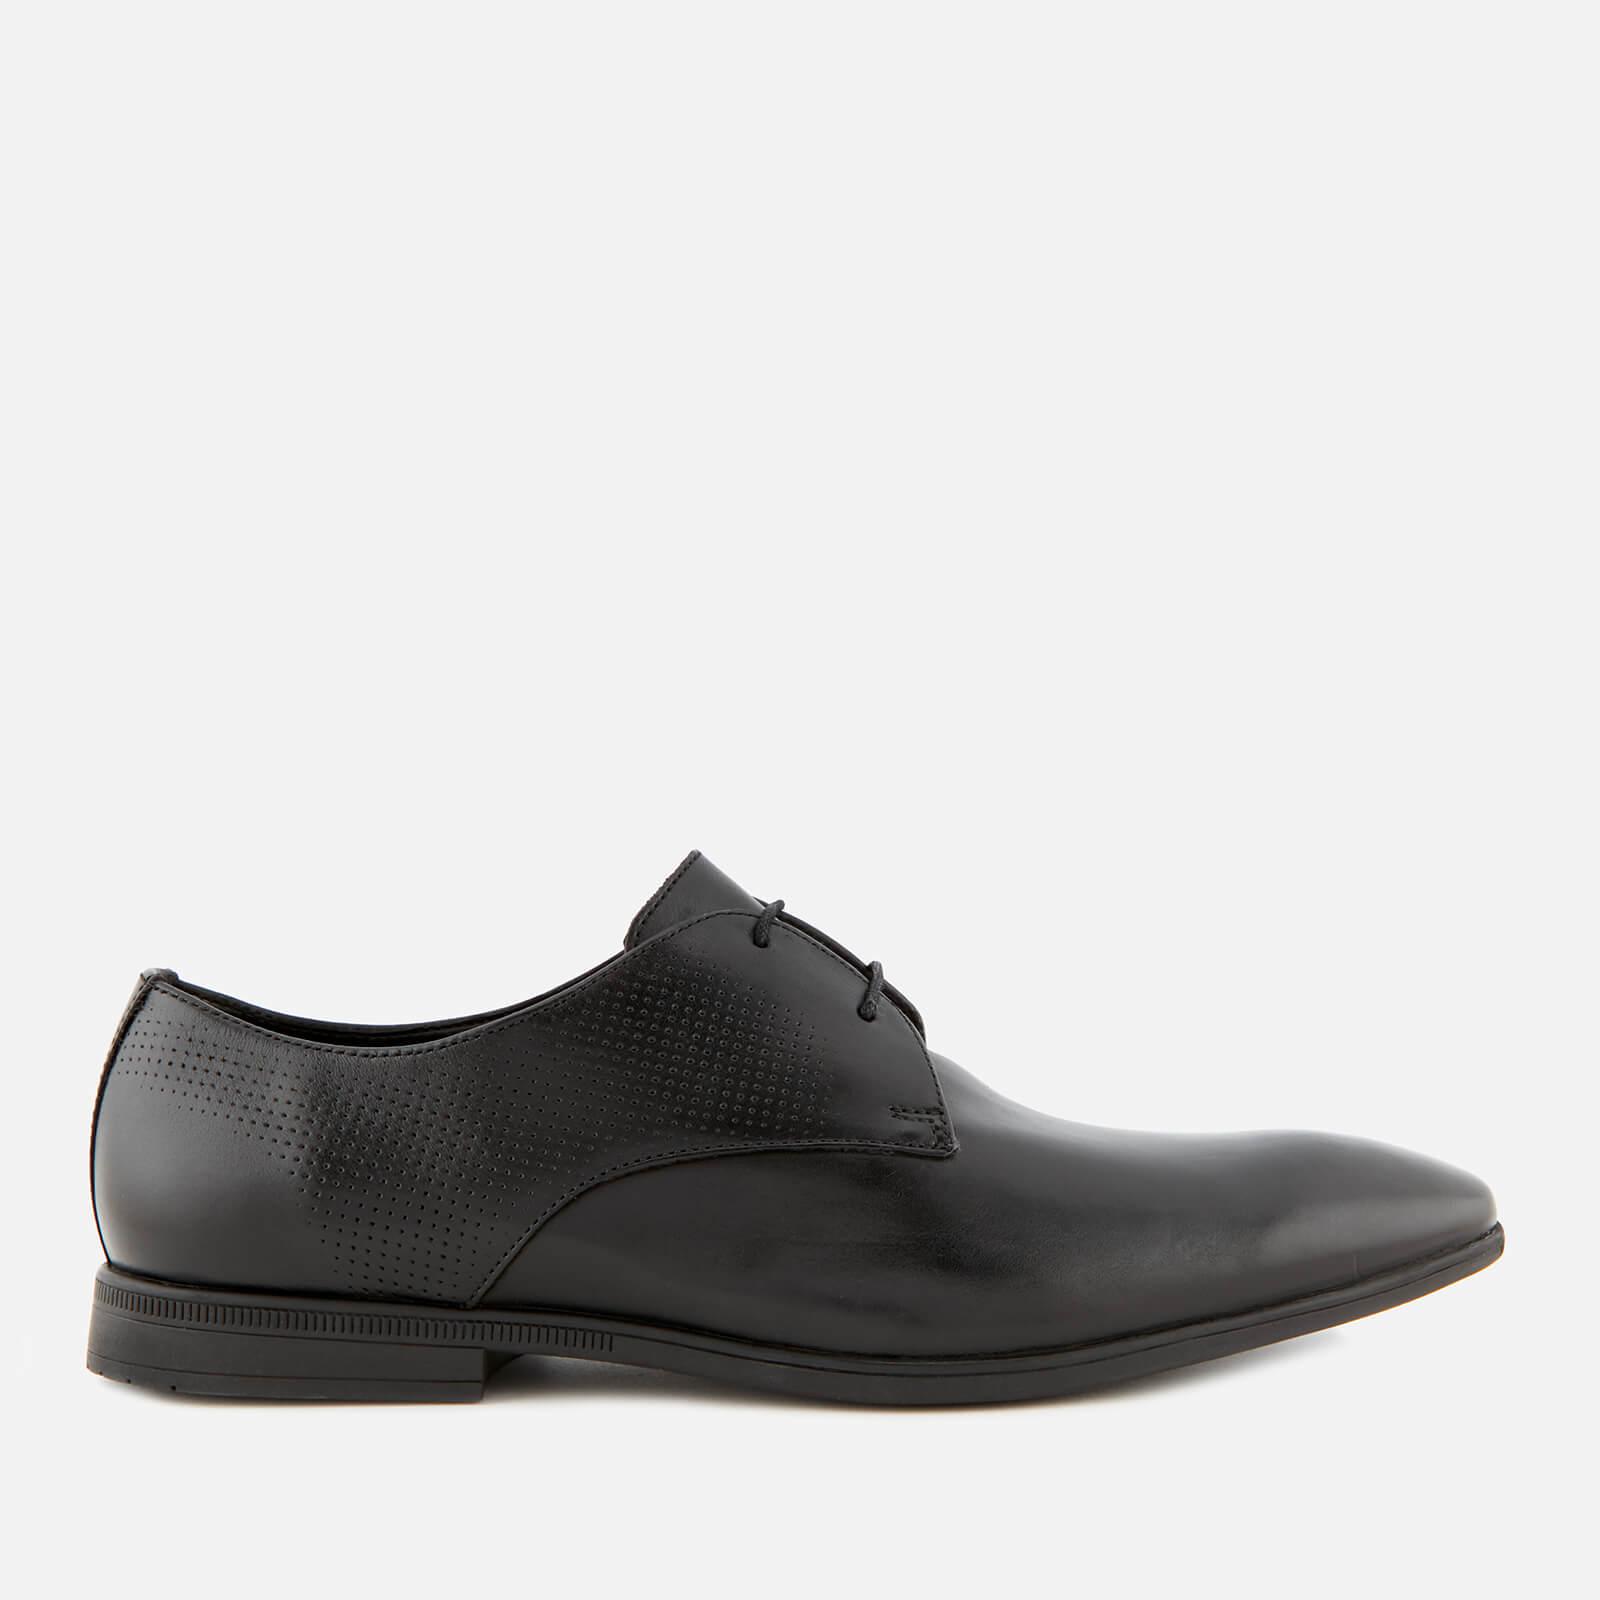 Clarks Men's Bampton Walk Leather Derby Shoes - Black - UK 10 - Black